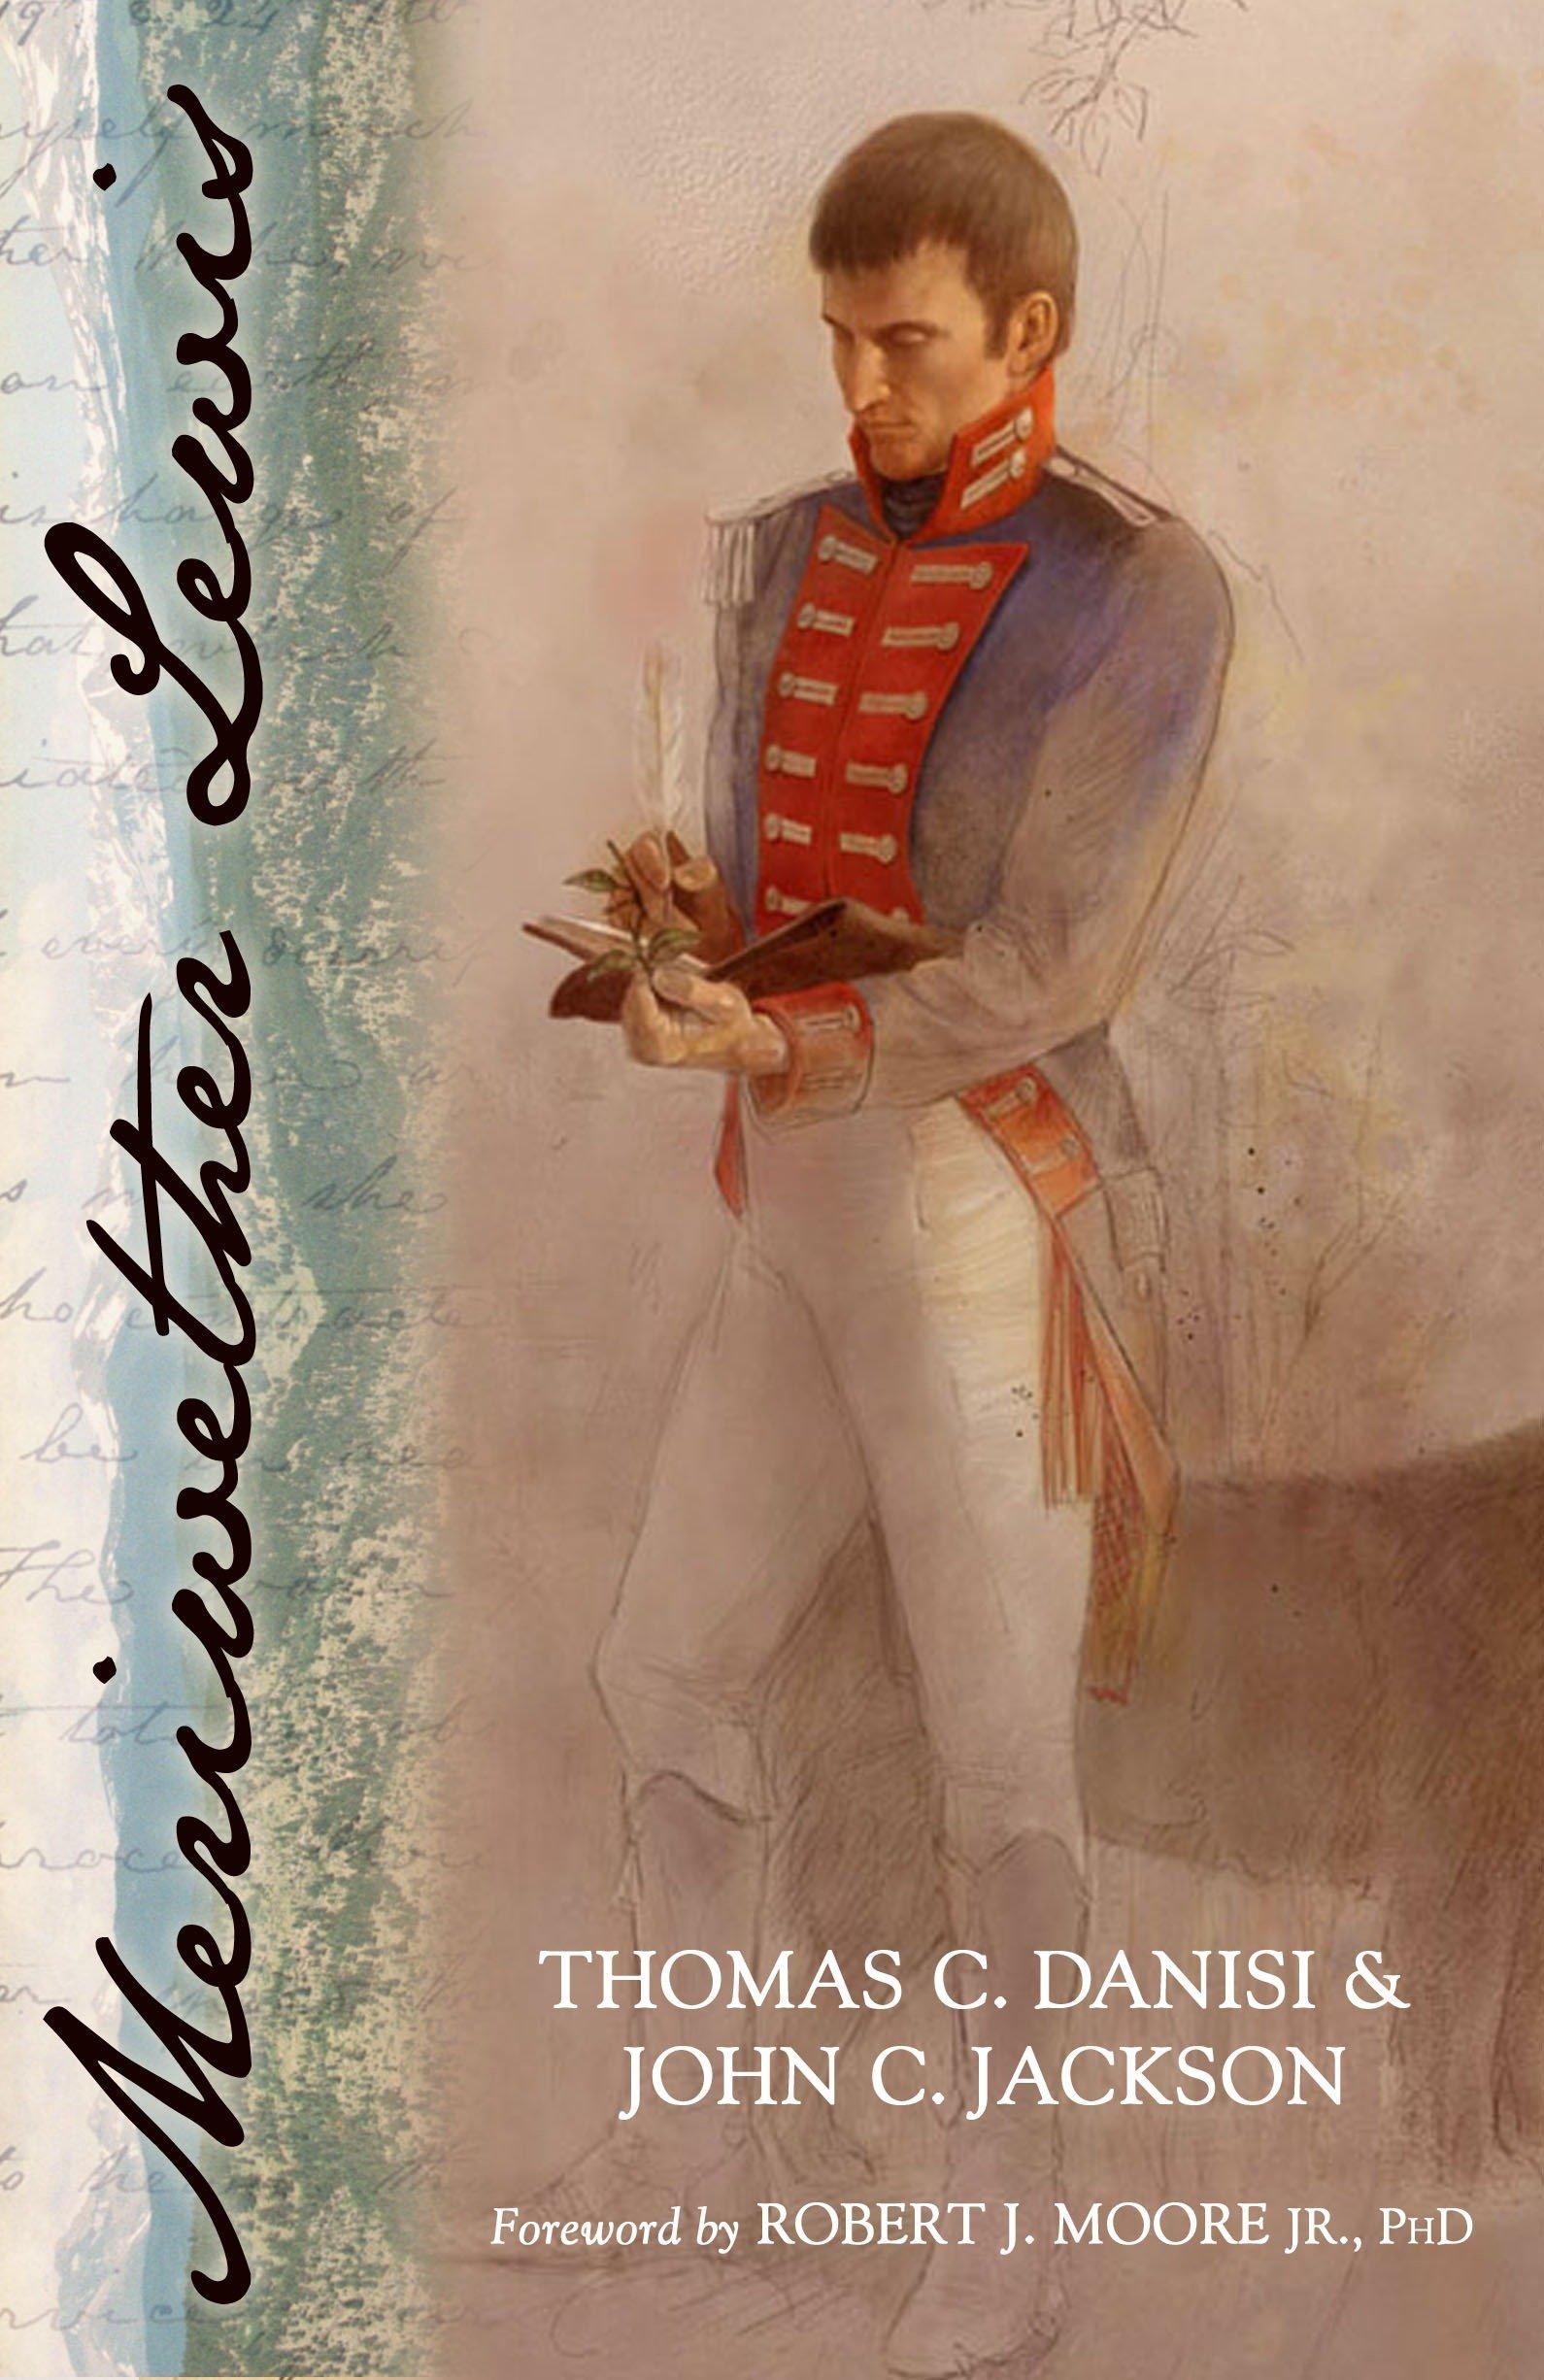 Meriwether Lewis: Thomas C. Danisi, John C. Jackson, Robert J. Moore Jr.  PH.D.: 9781591027027: Amazon.com: Books